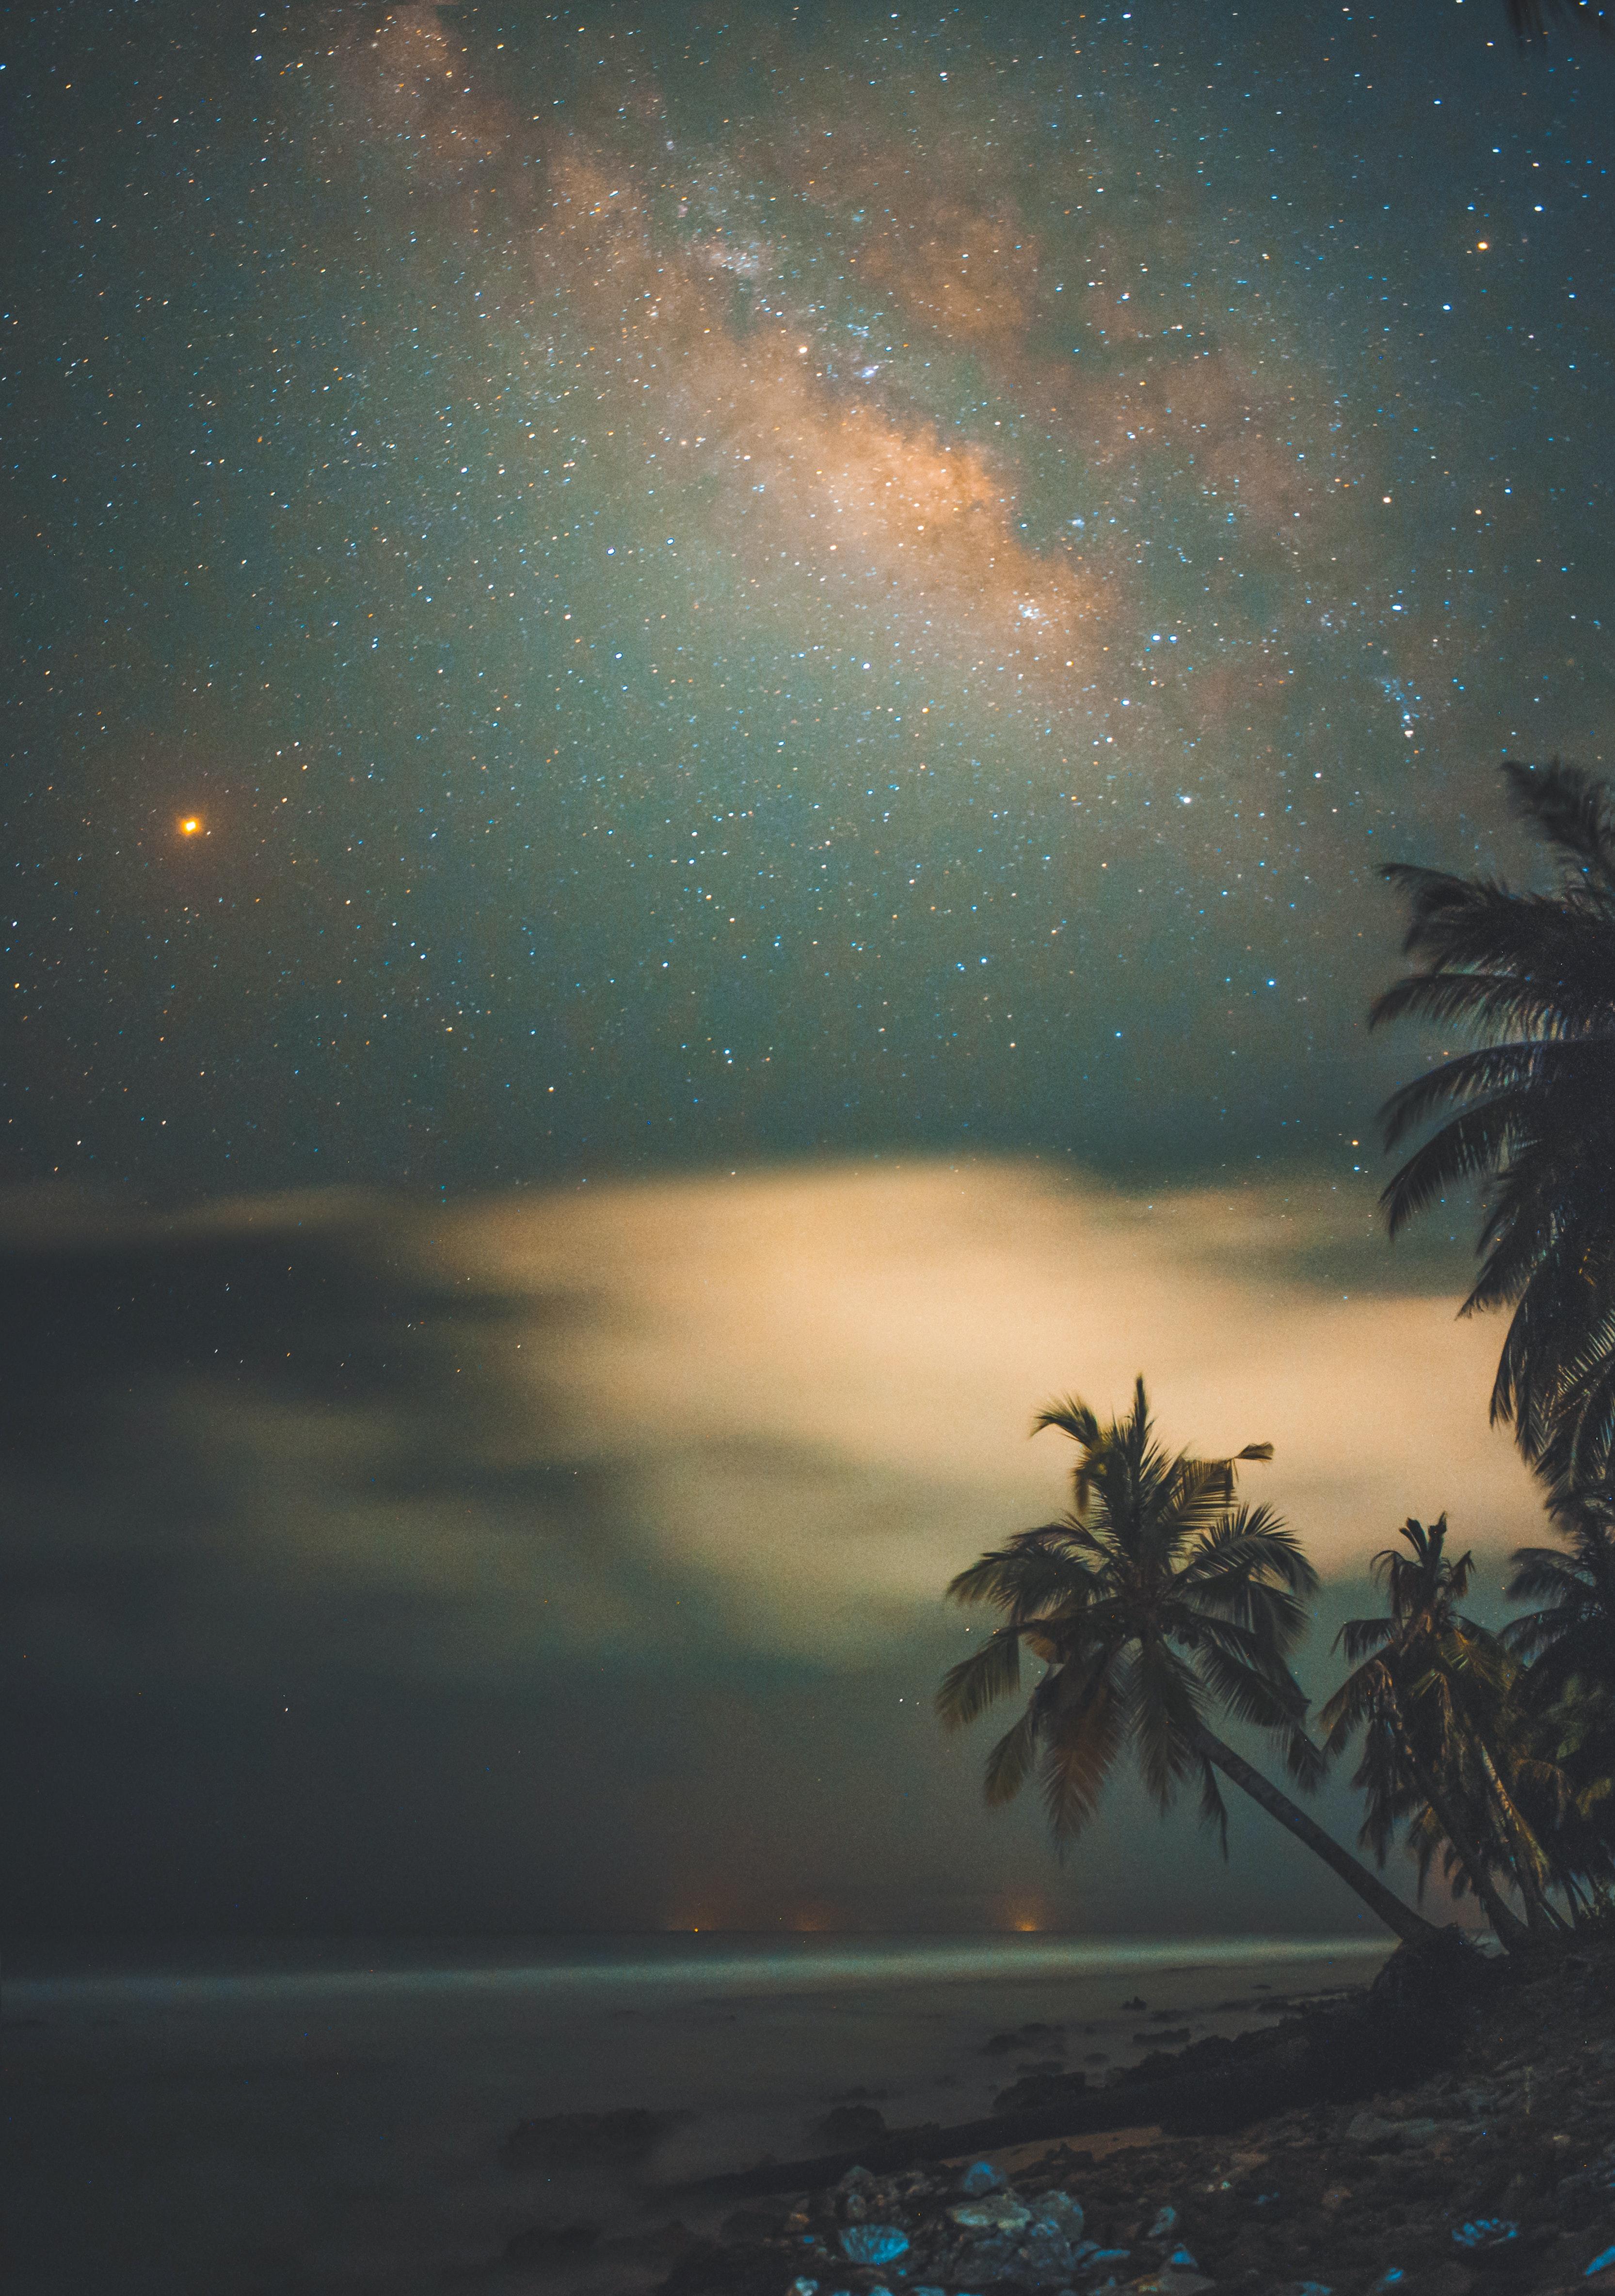 A romantic night at the Maldives